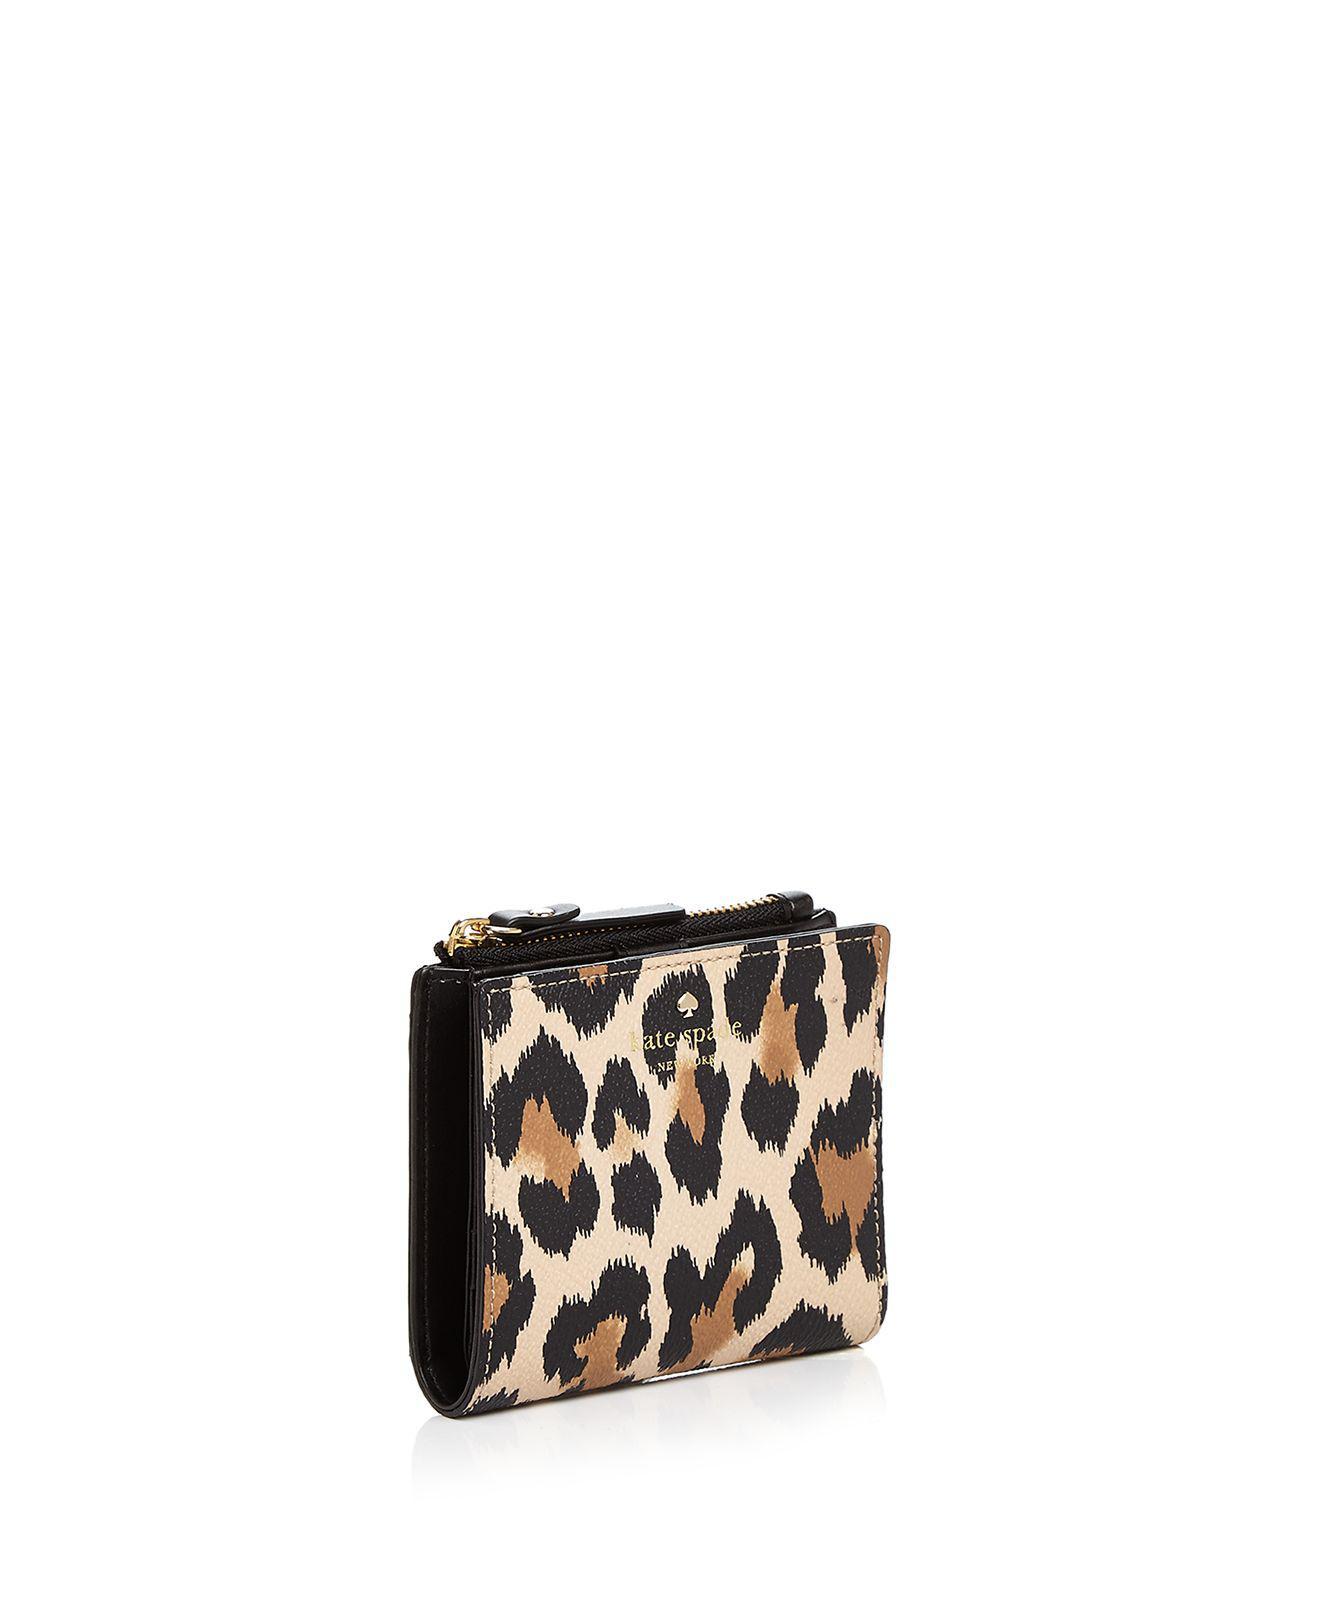 51d8bef60be7 Kate Spade Hyde Lane Adalyn Leopard Print Leather Wallet - Lyst